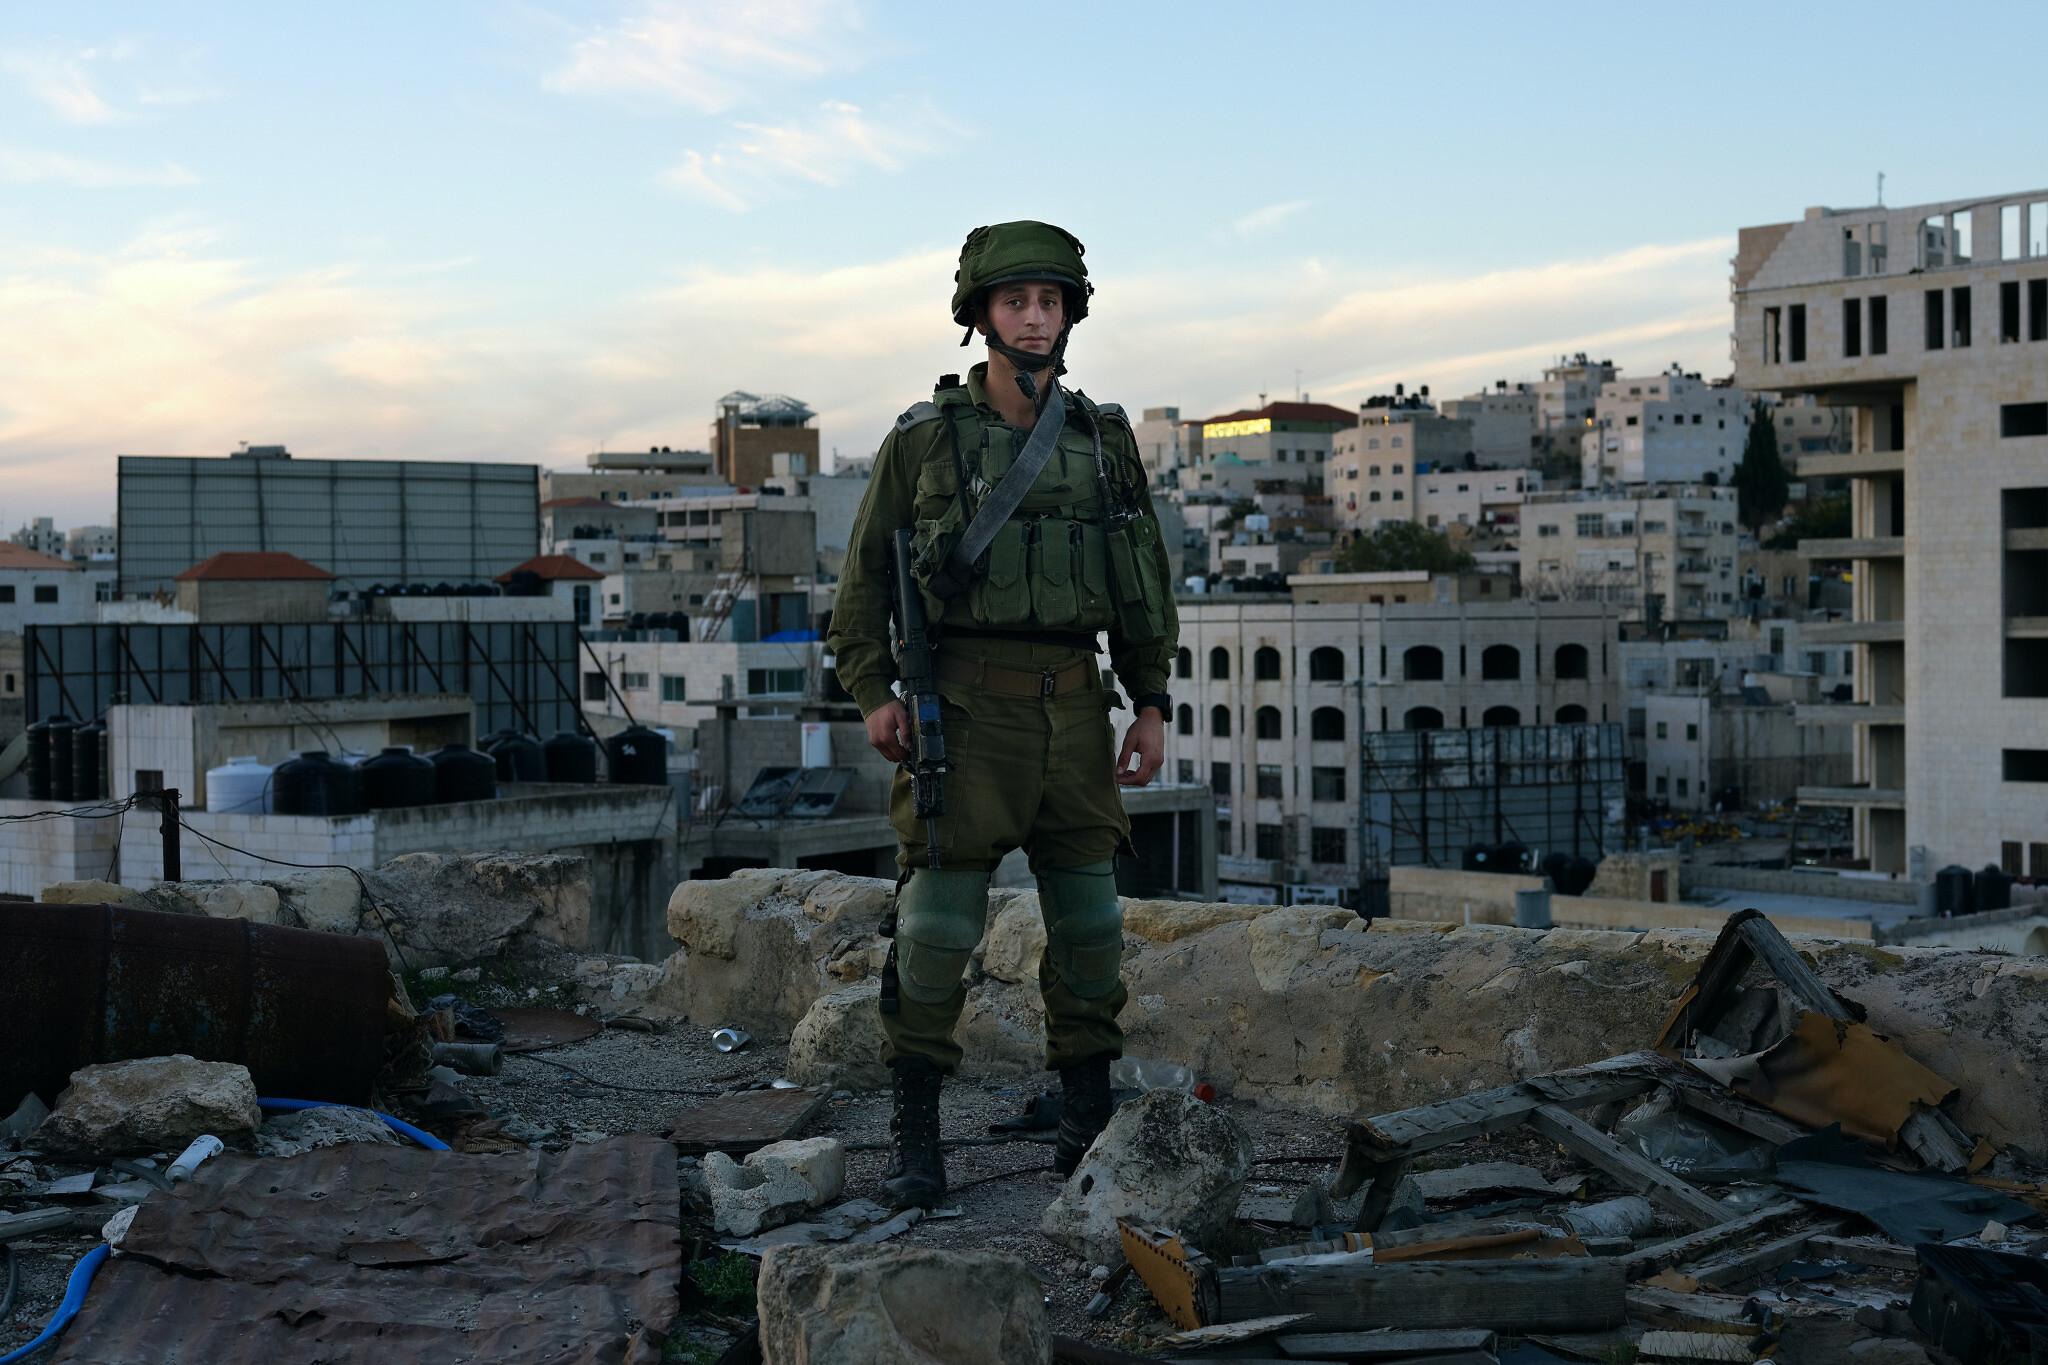 'Josh, 22. West Caldwell, New Jersey, USA, Infantry Platoon Commander' (Brant Slomovic)